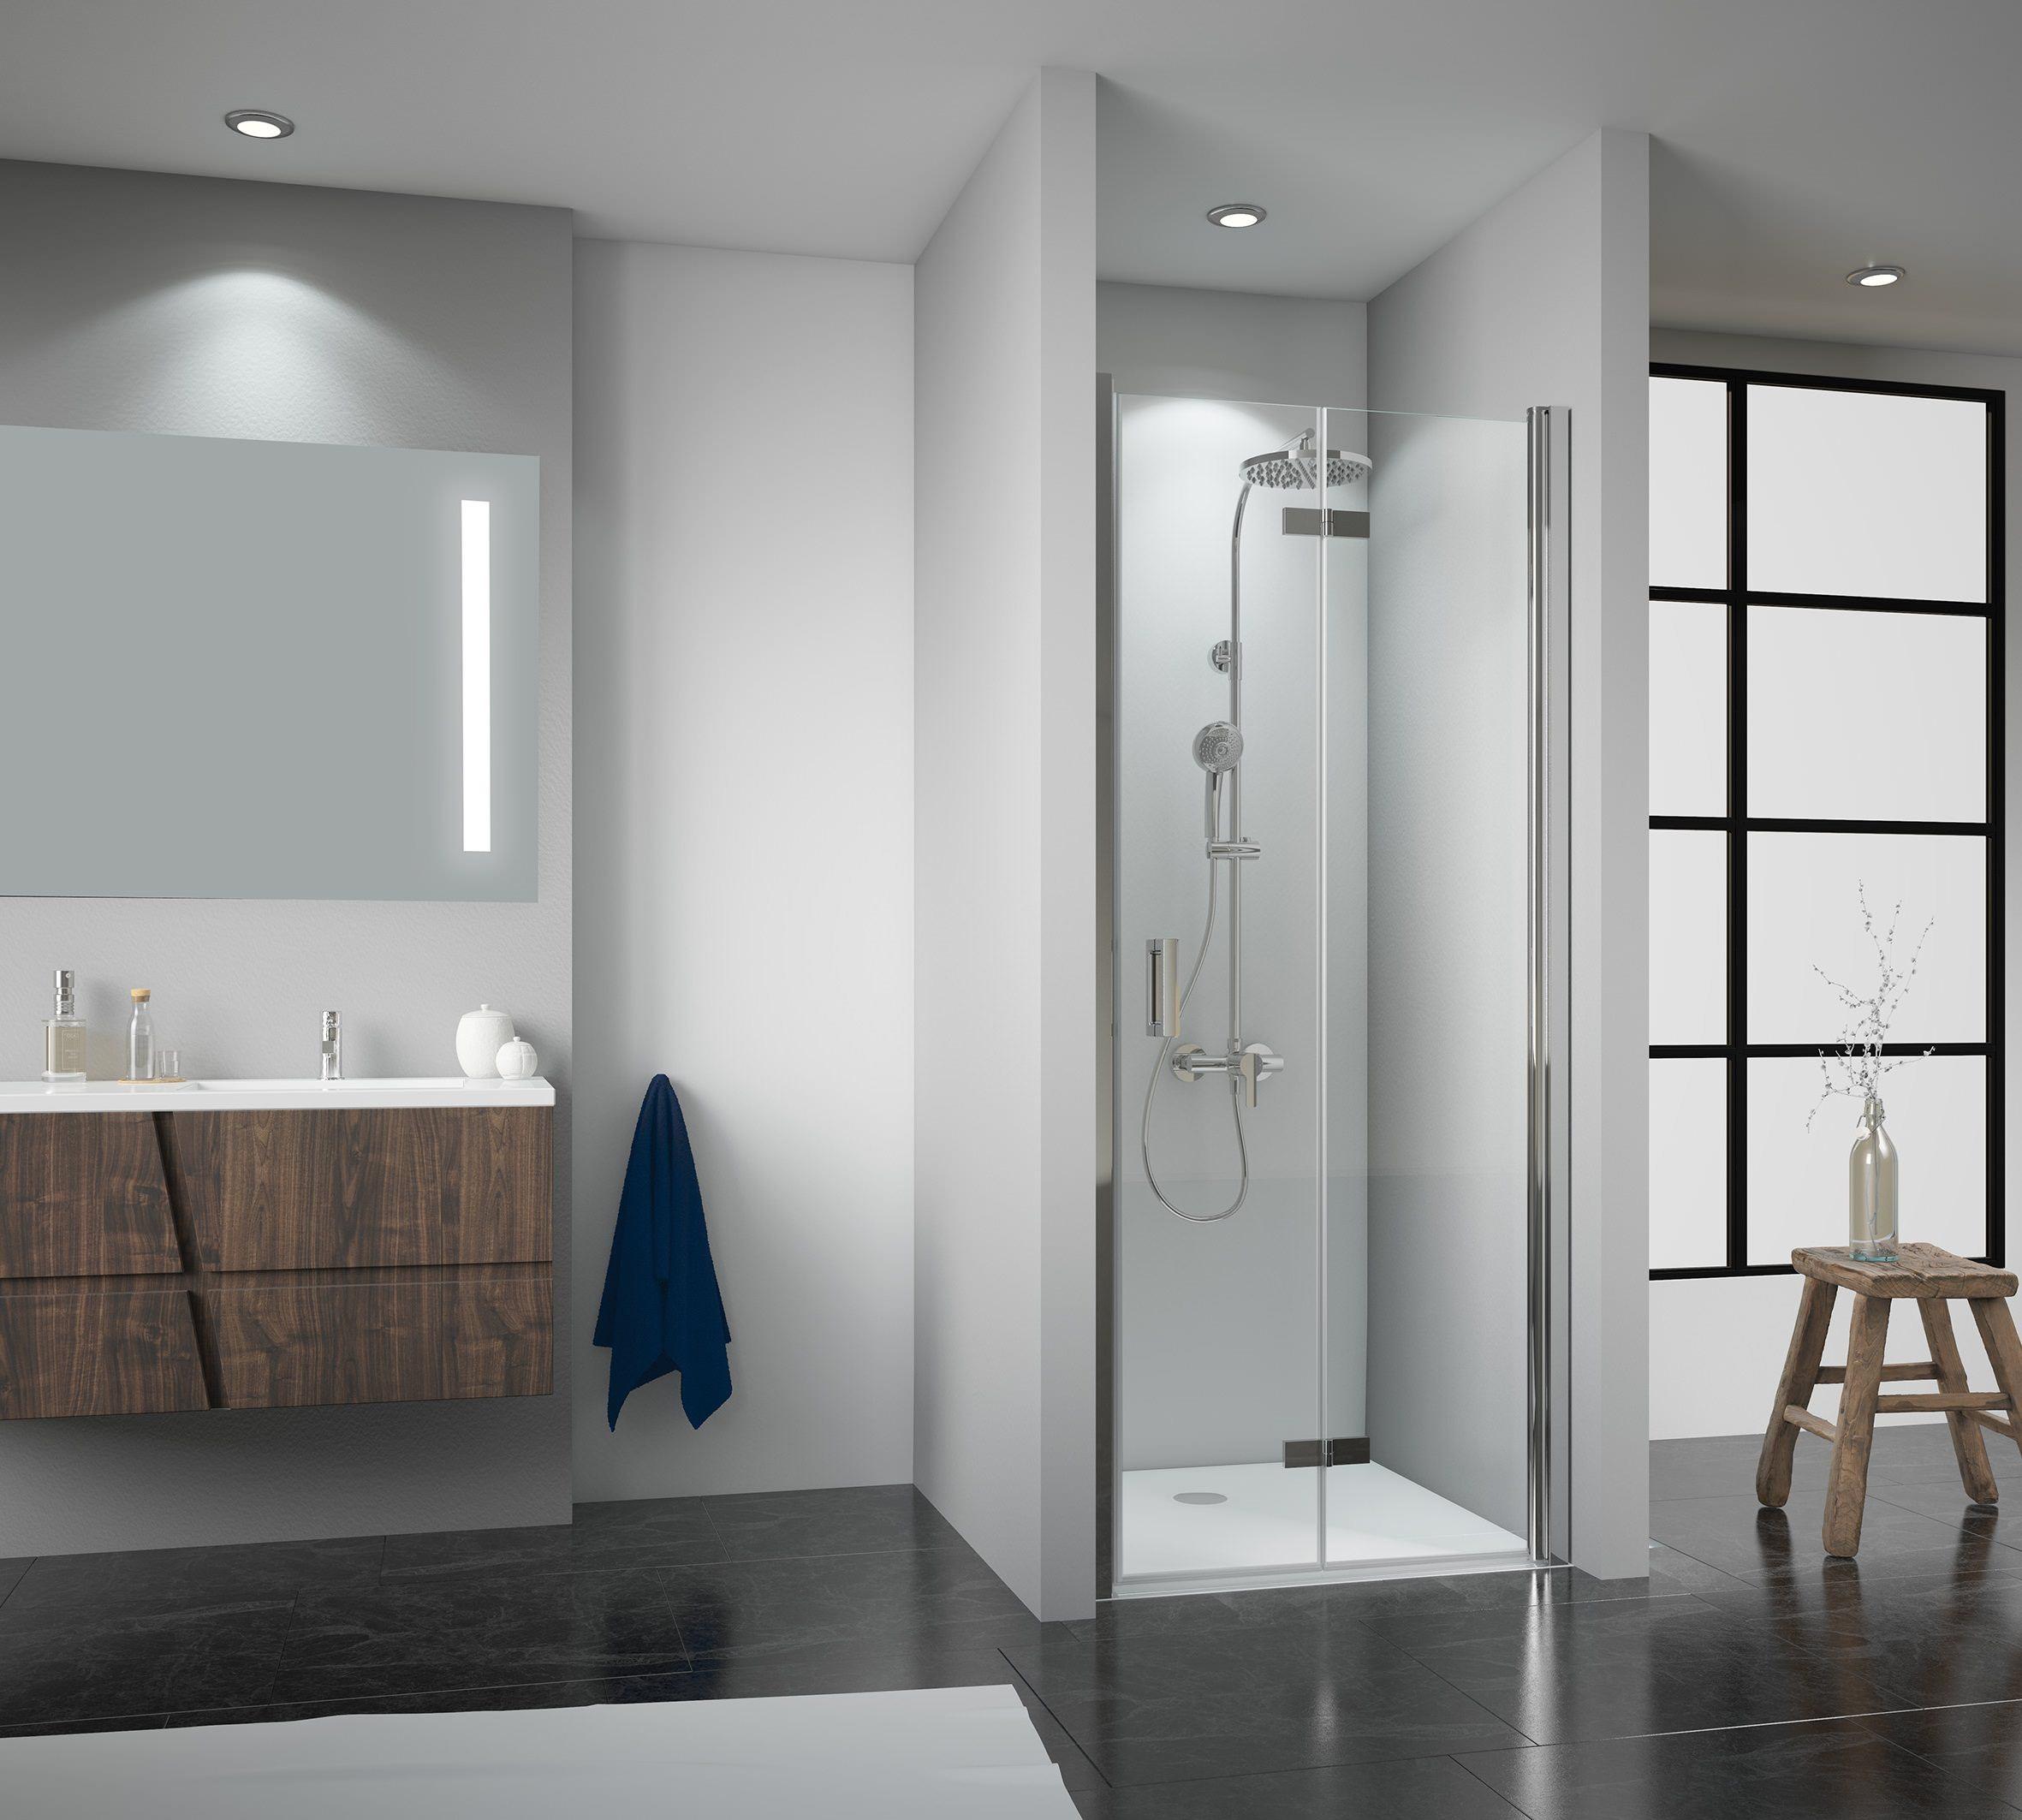 breuer panorama drehfaltt r f r nische klarglas hell alu chromeffekt 80cm 202 4cm anschlag. Black Bedroom Furniture Sets. Home Design Ideas